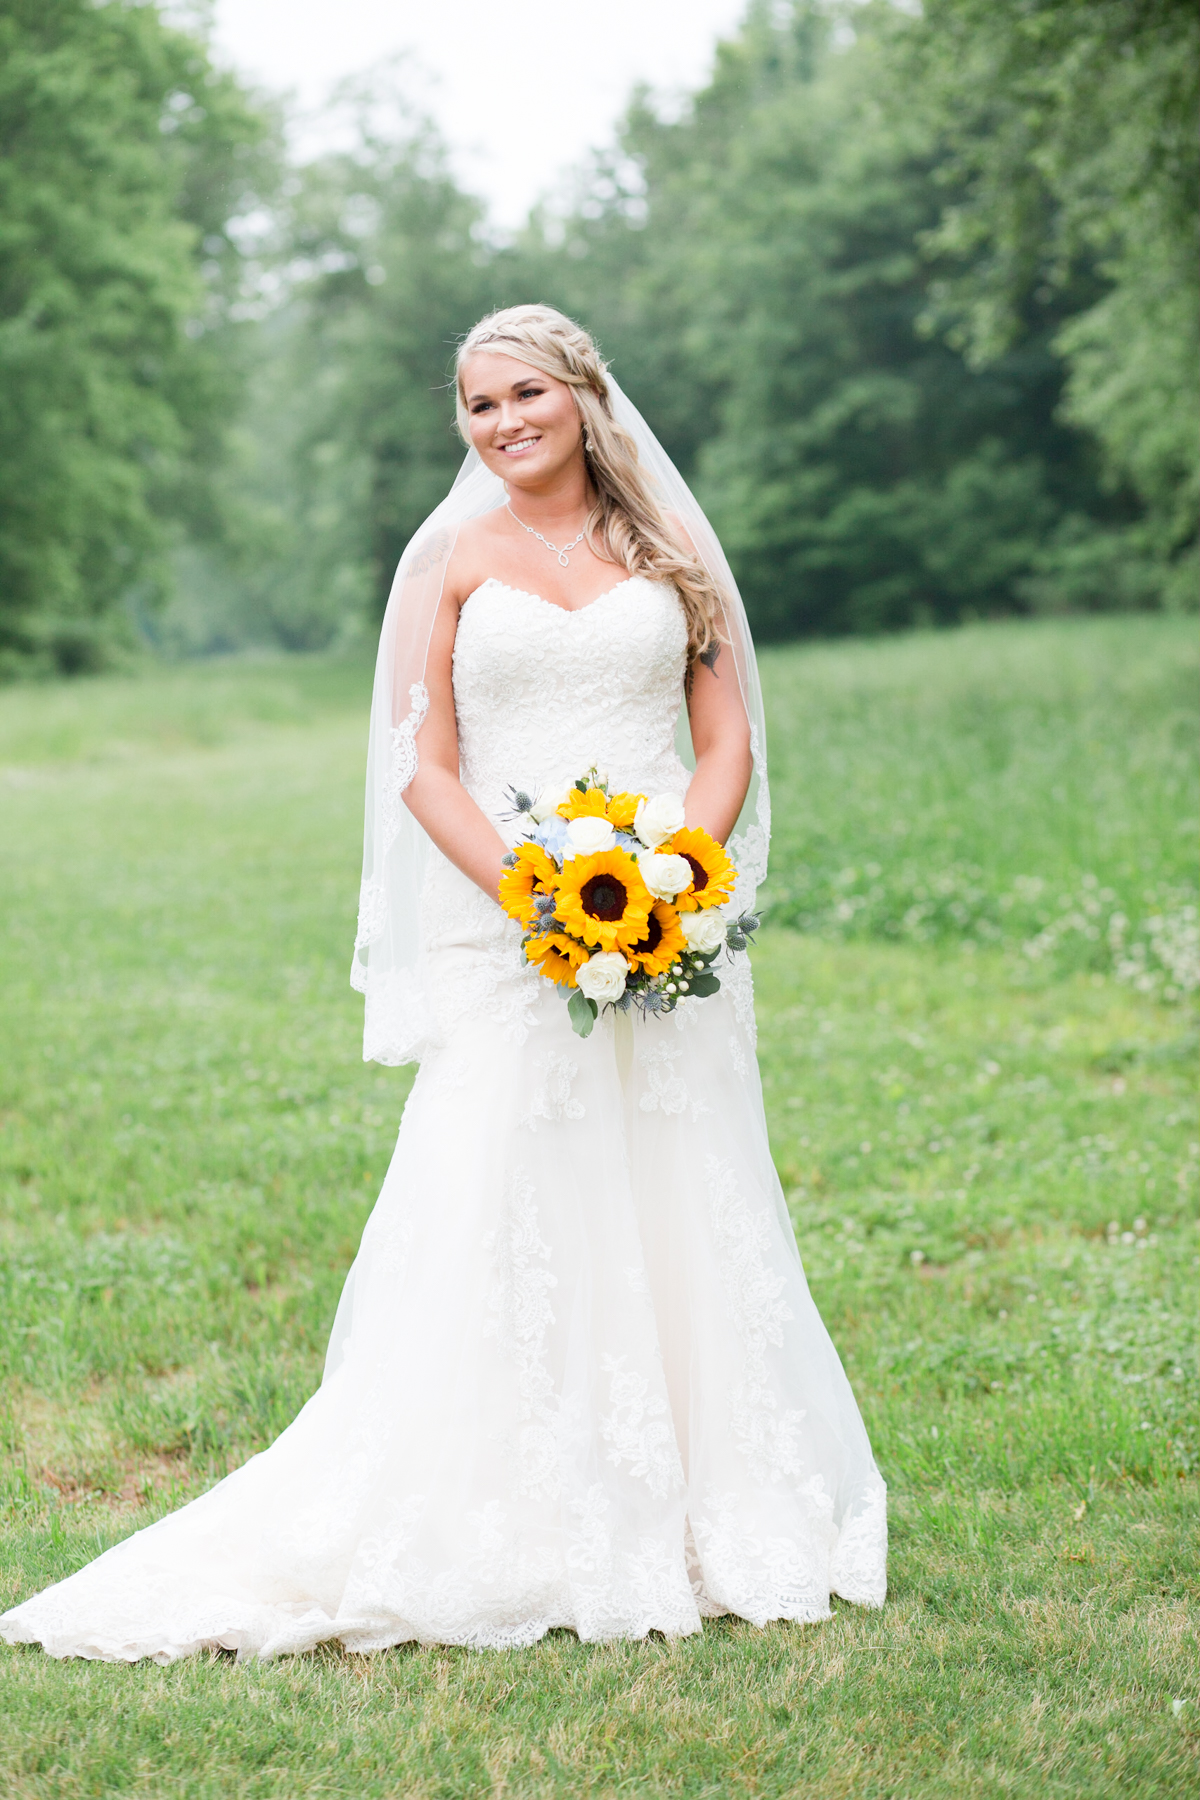 The-venue-at-white-oak-farms-wedding-nashville-wedding-photographers-0305.jpg